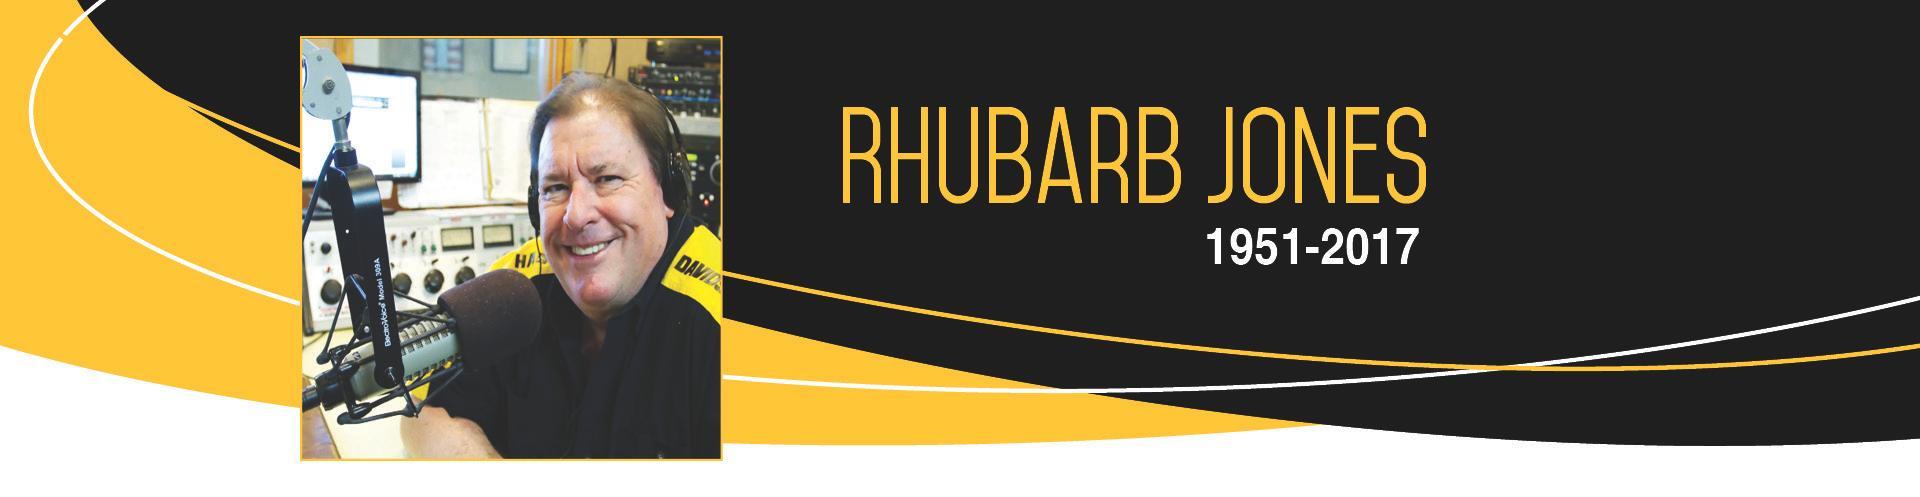 Tribute Honors Radio Personality Rhubarb Jones